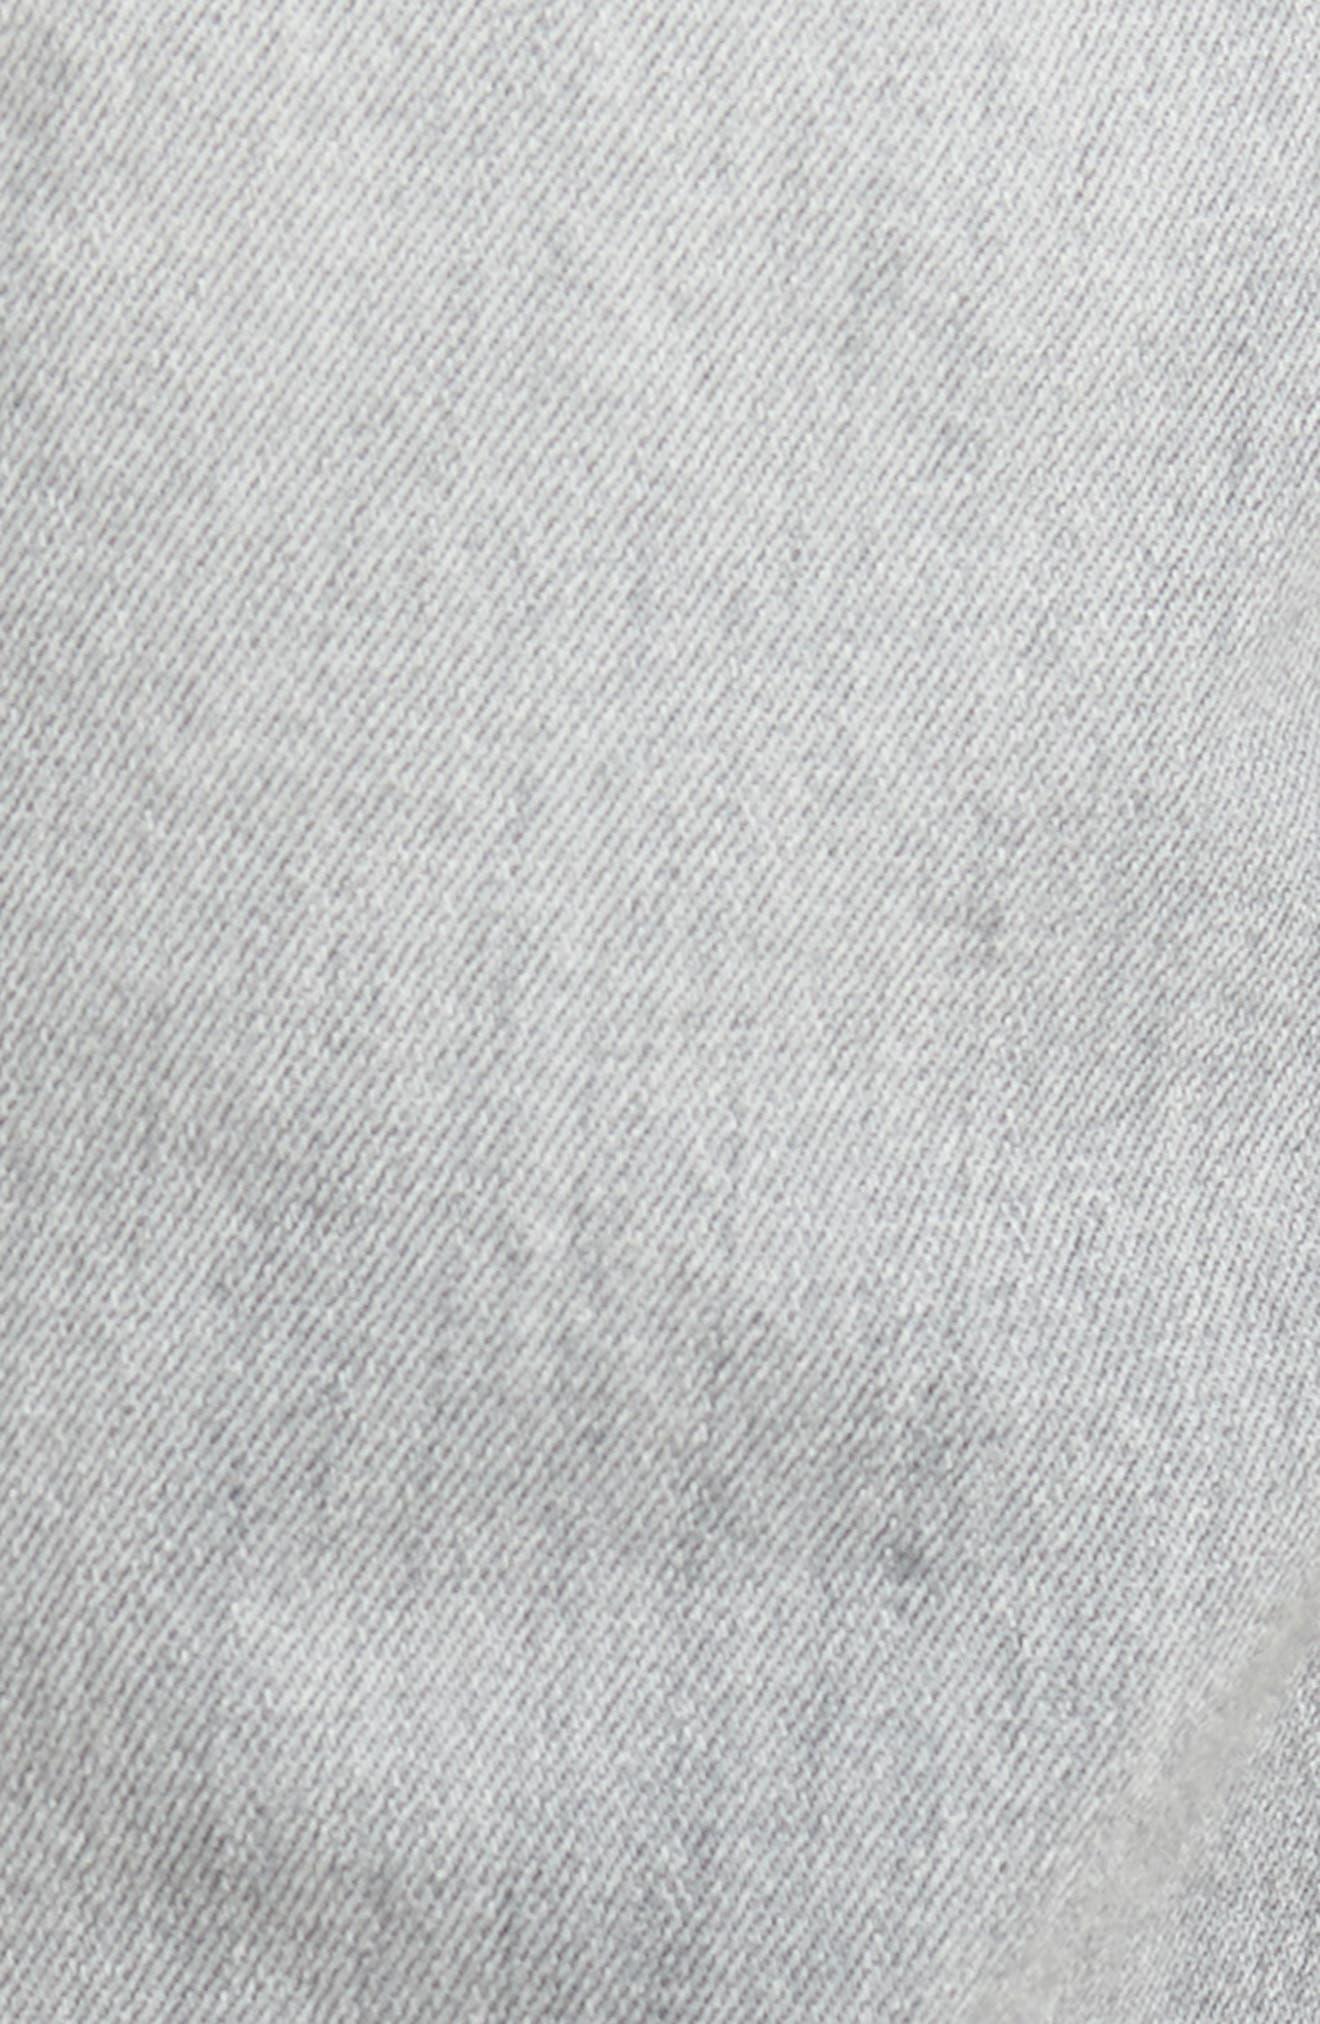 Graduate Slim Straight Leg Jeans,                             Alternate thumbnail 5, color,